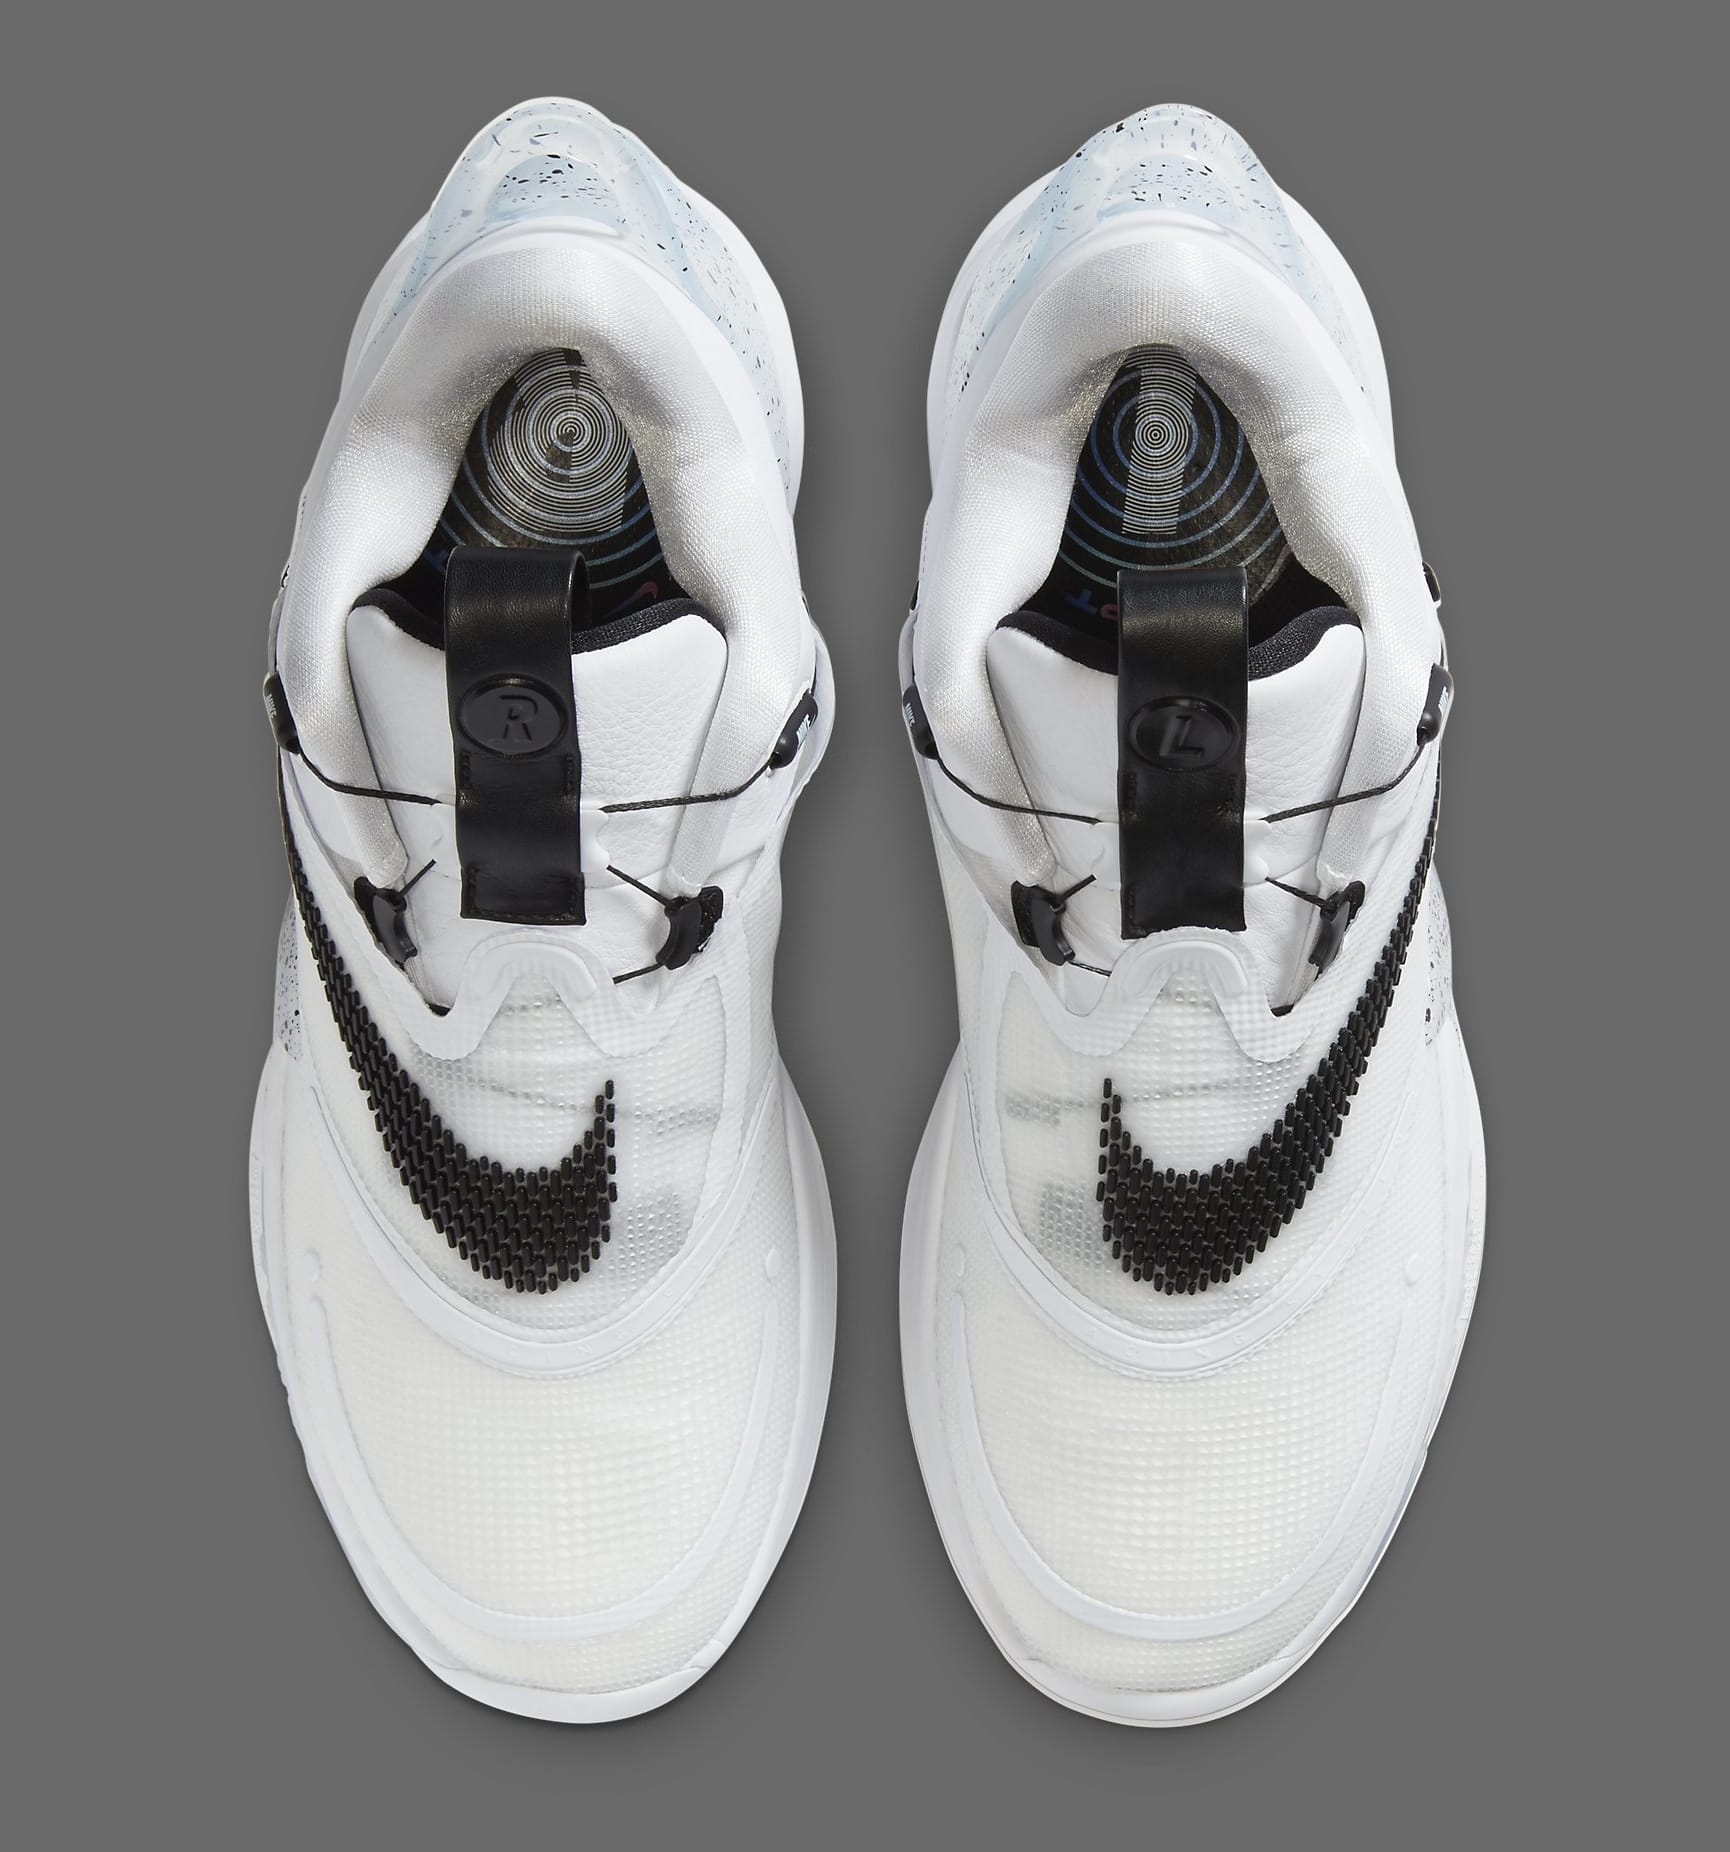 Nike Adapt BB 2.0 'Oreo' BQ5397-101 Top